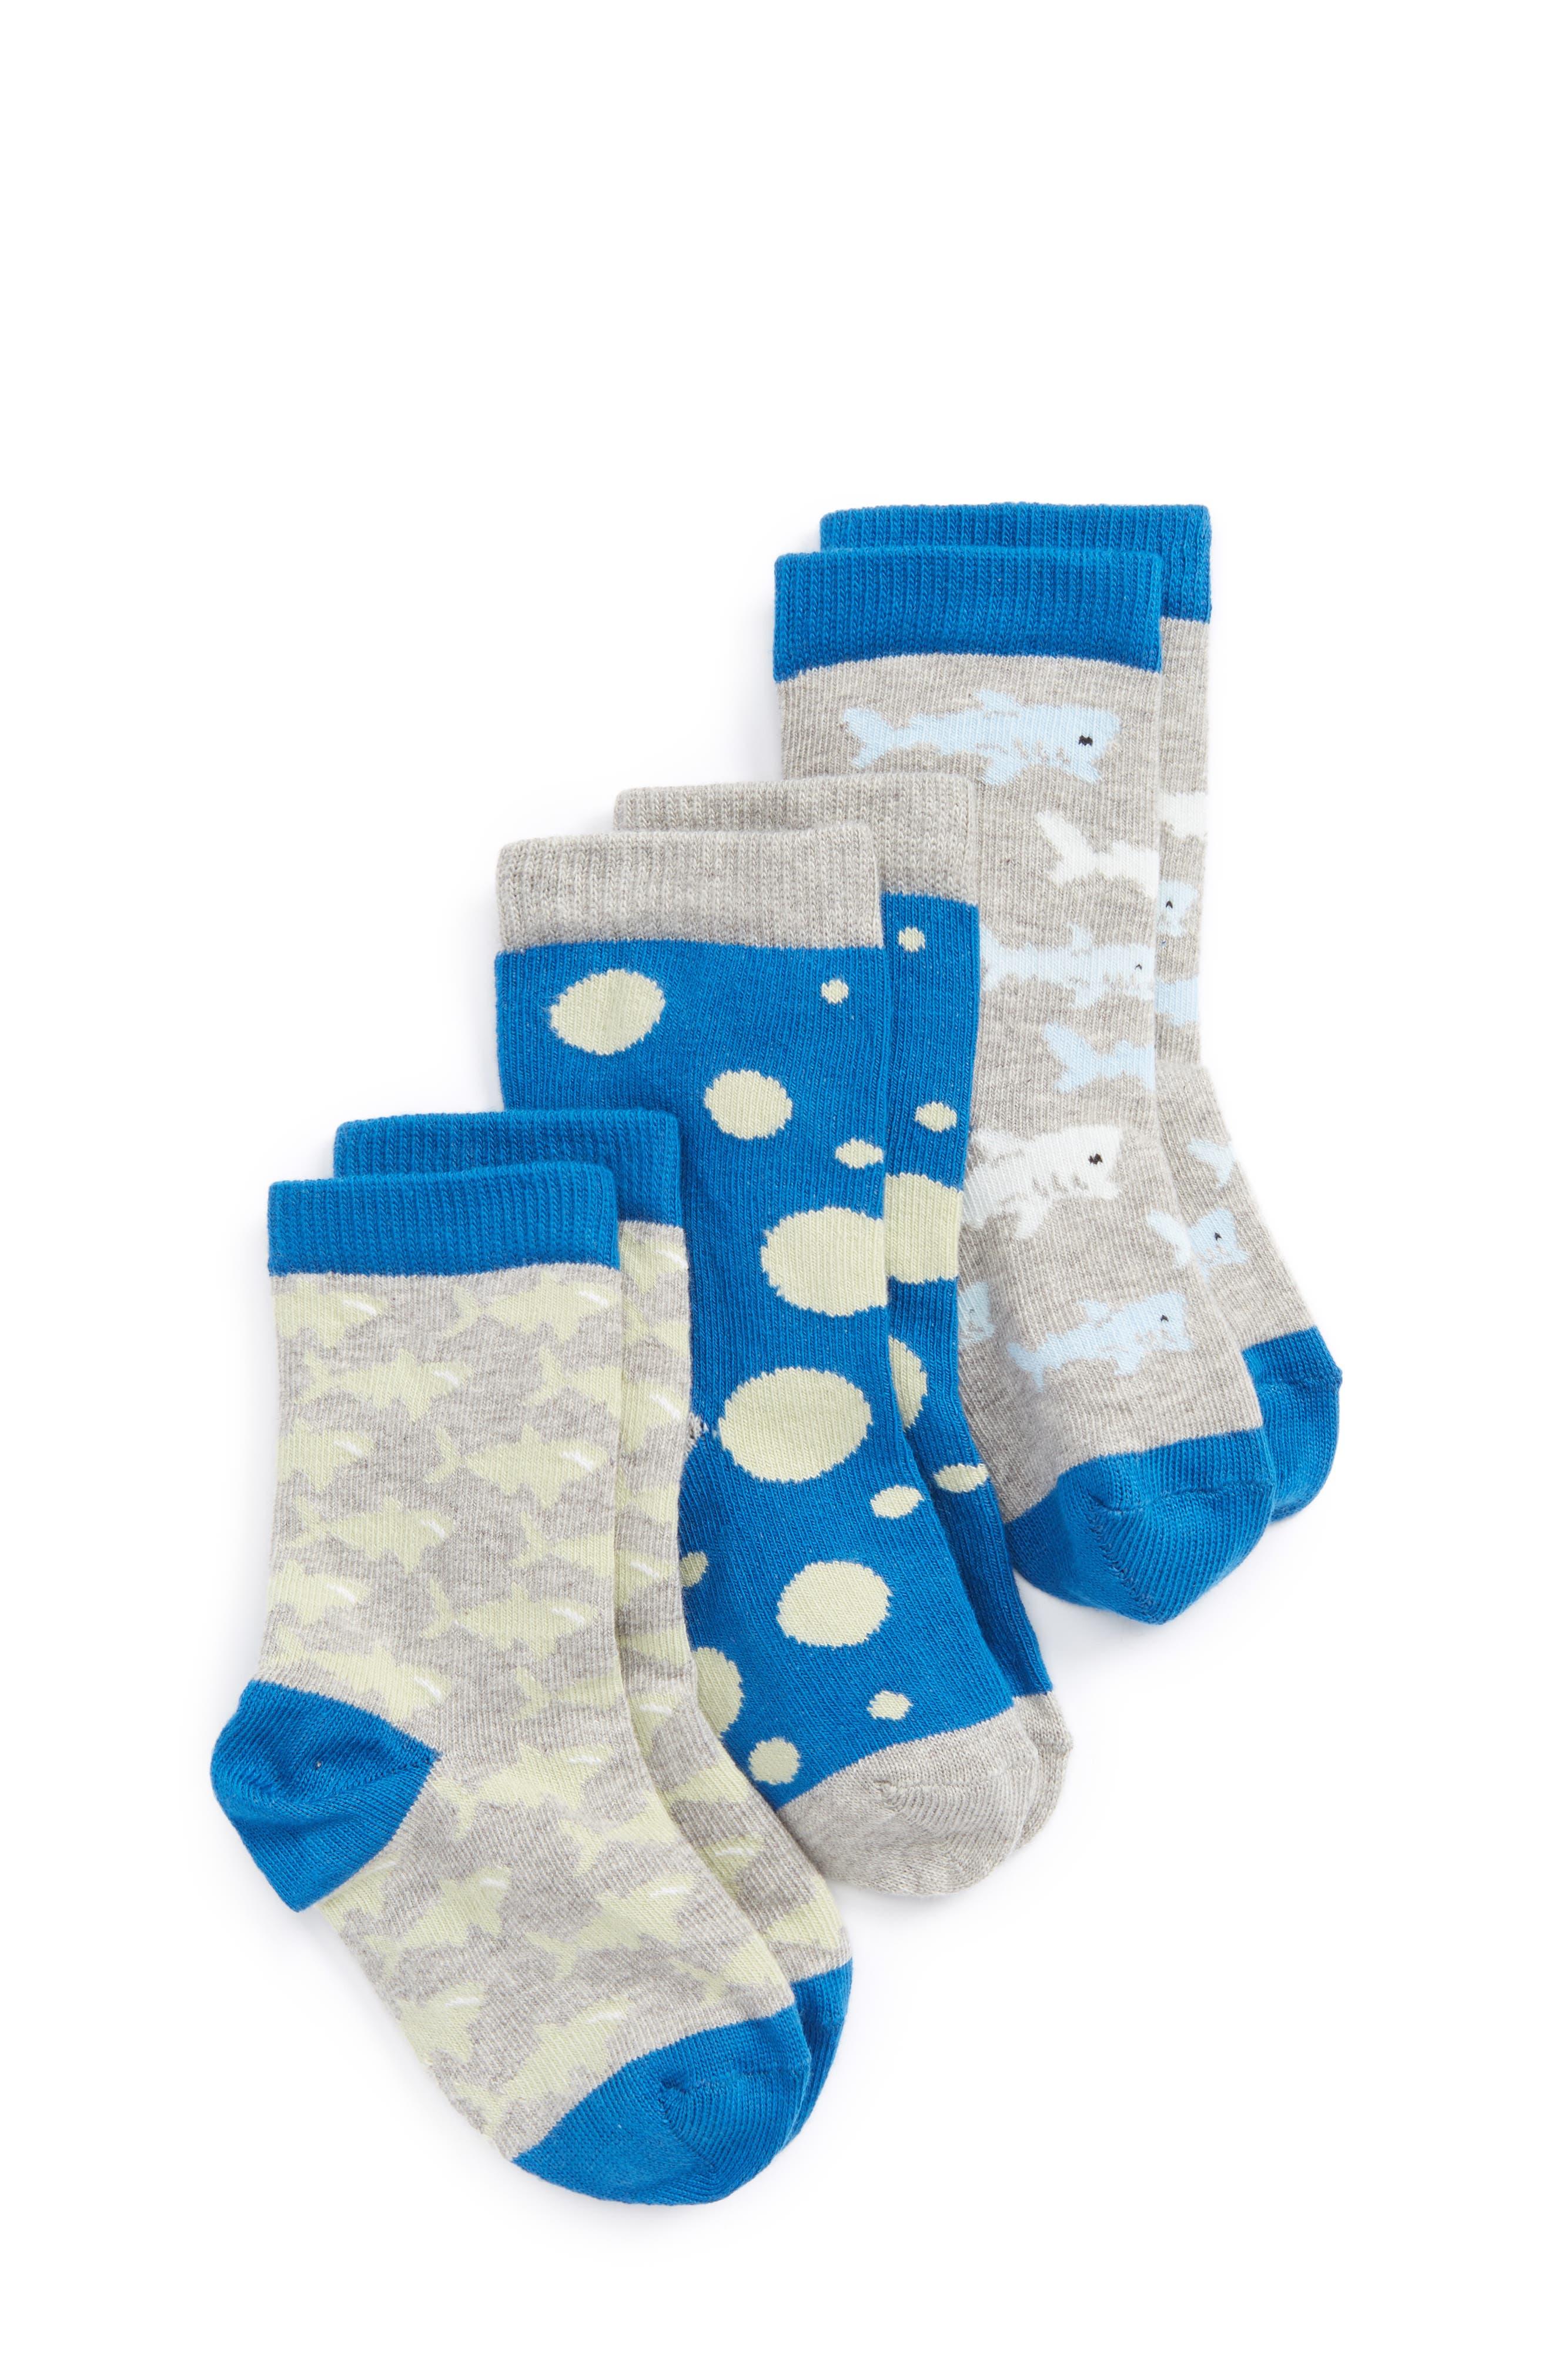 Main Image - Tucker + Tate Critter Assorted 3-Pack Crew Socks (Walker, Toddler, Little Kid & Big Kid)